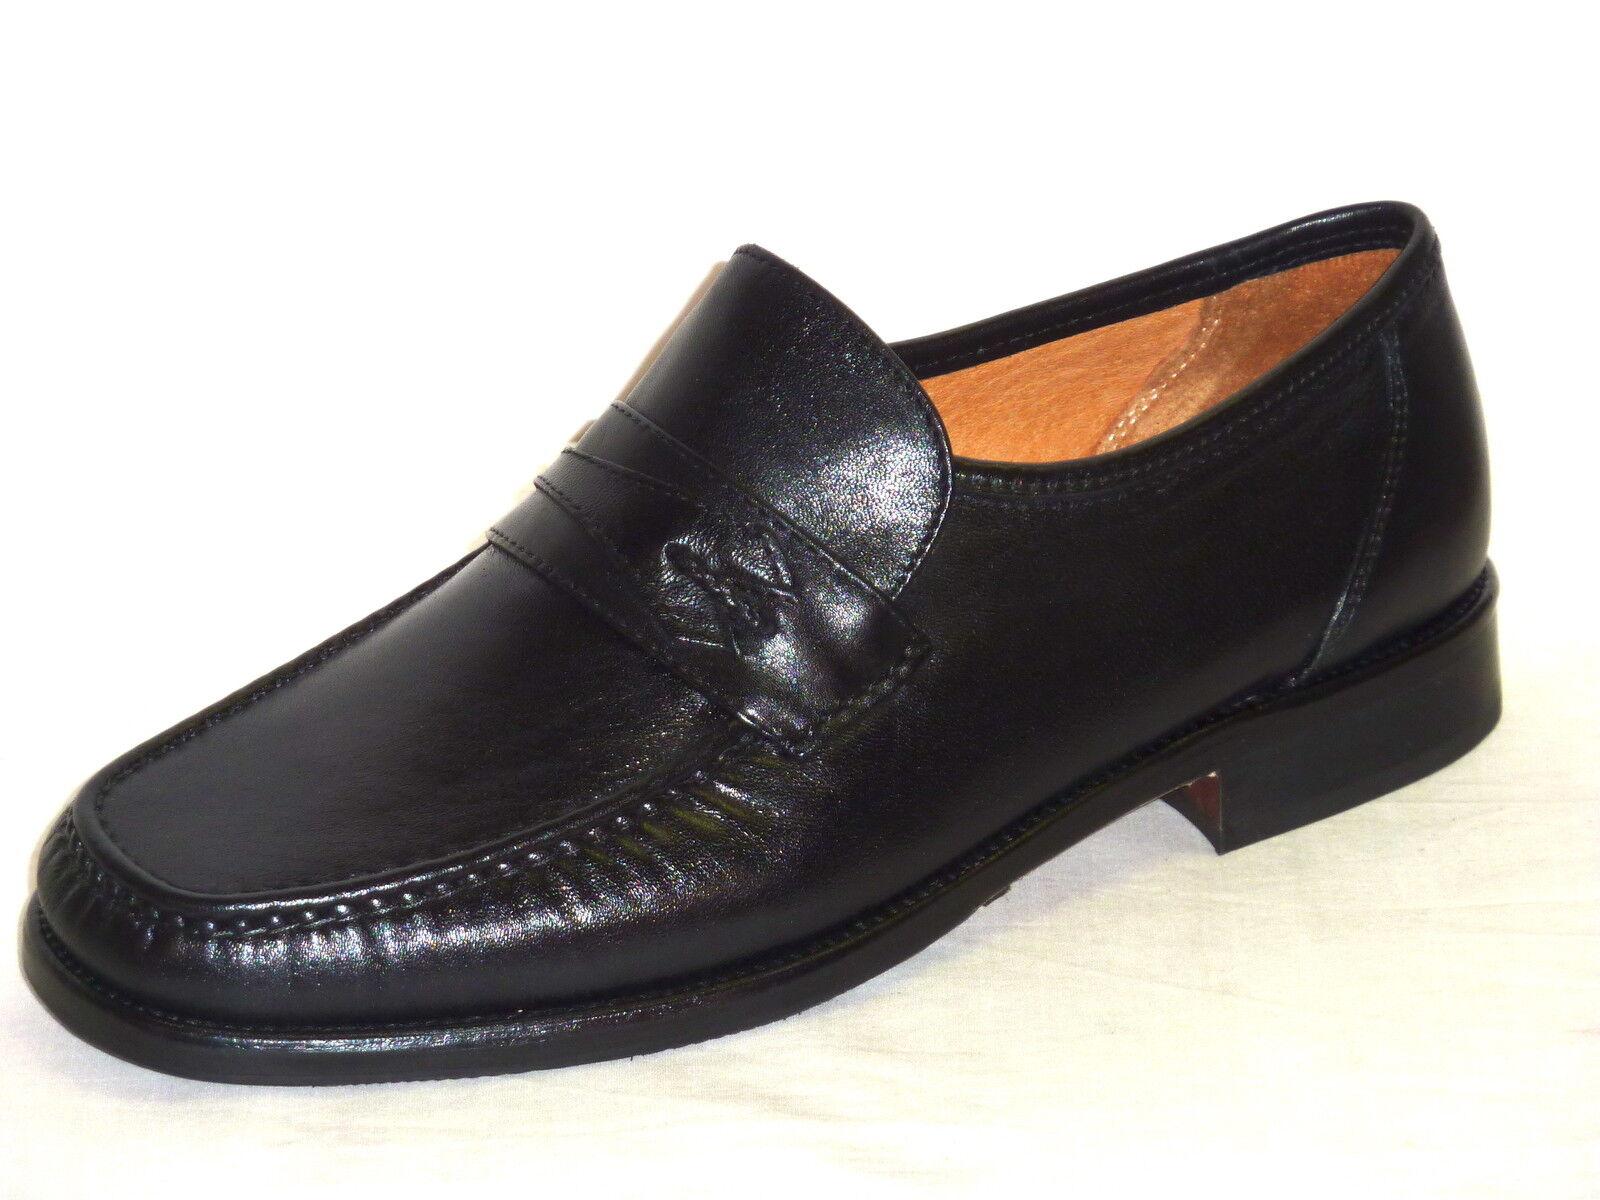 U4291H MELLUSO Herrenschuhe Mokassins schwarzes Leder mode komfortabel n. 42